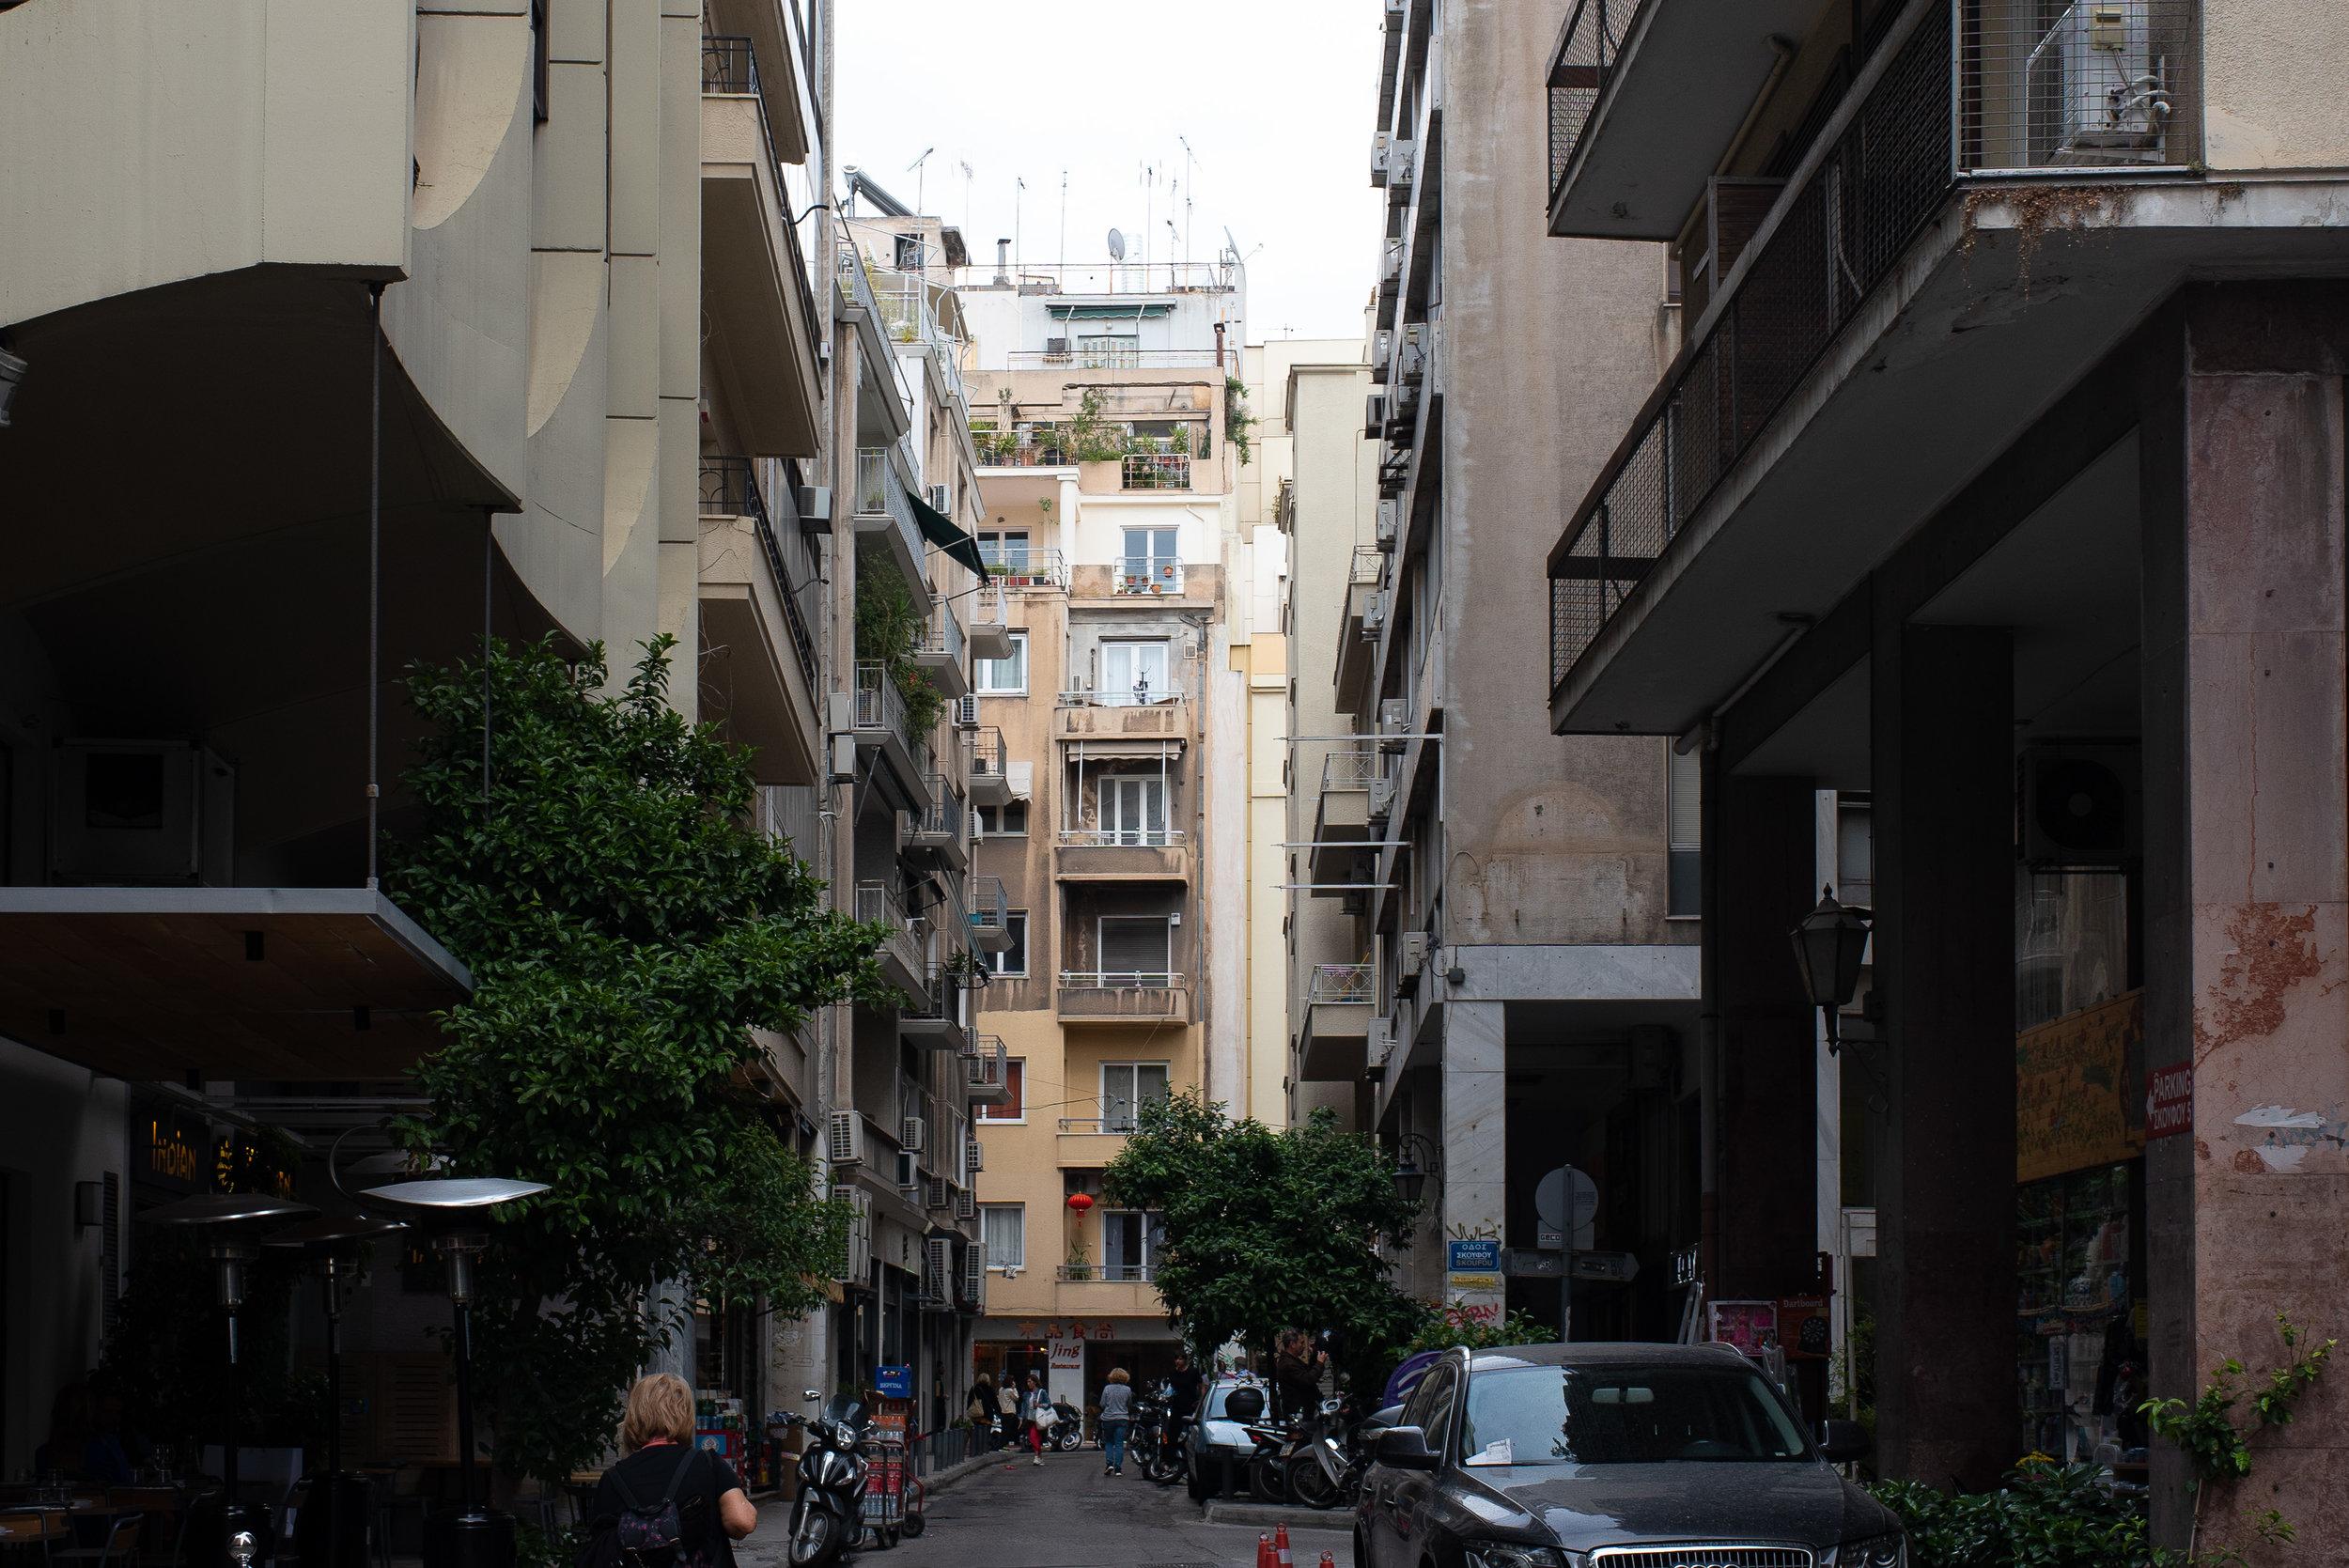 2019-May-14-Athens-Greece-043-2.jpg